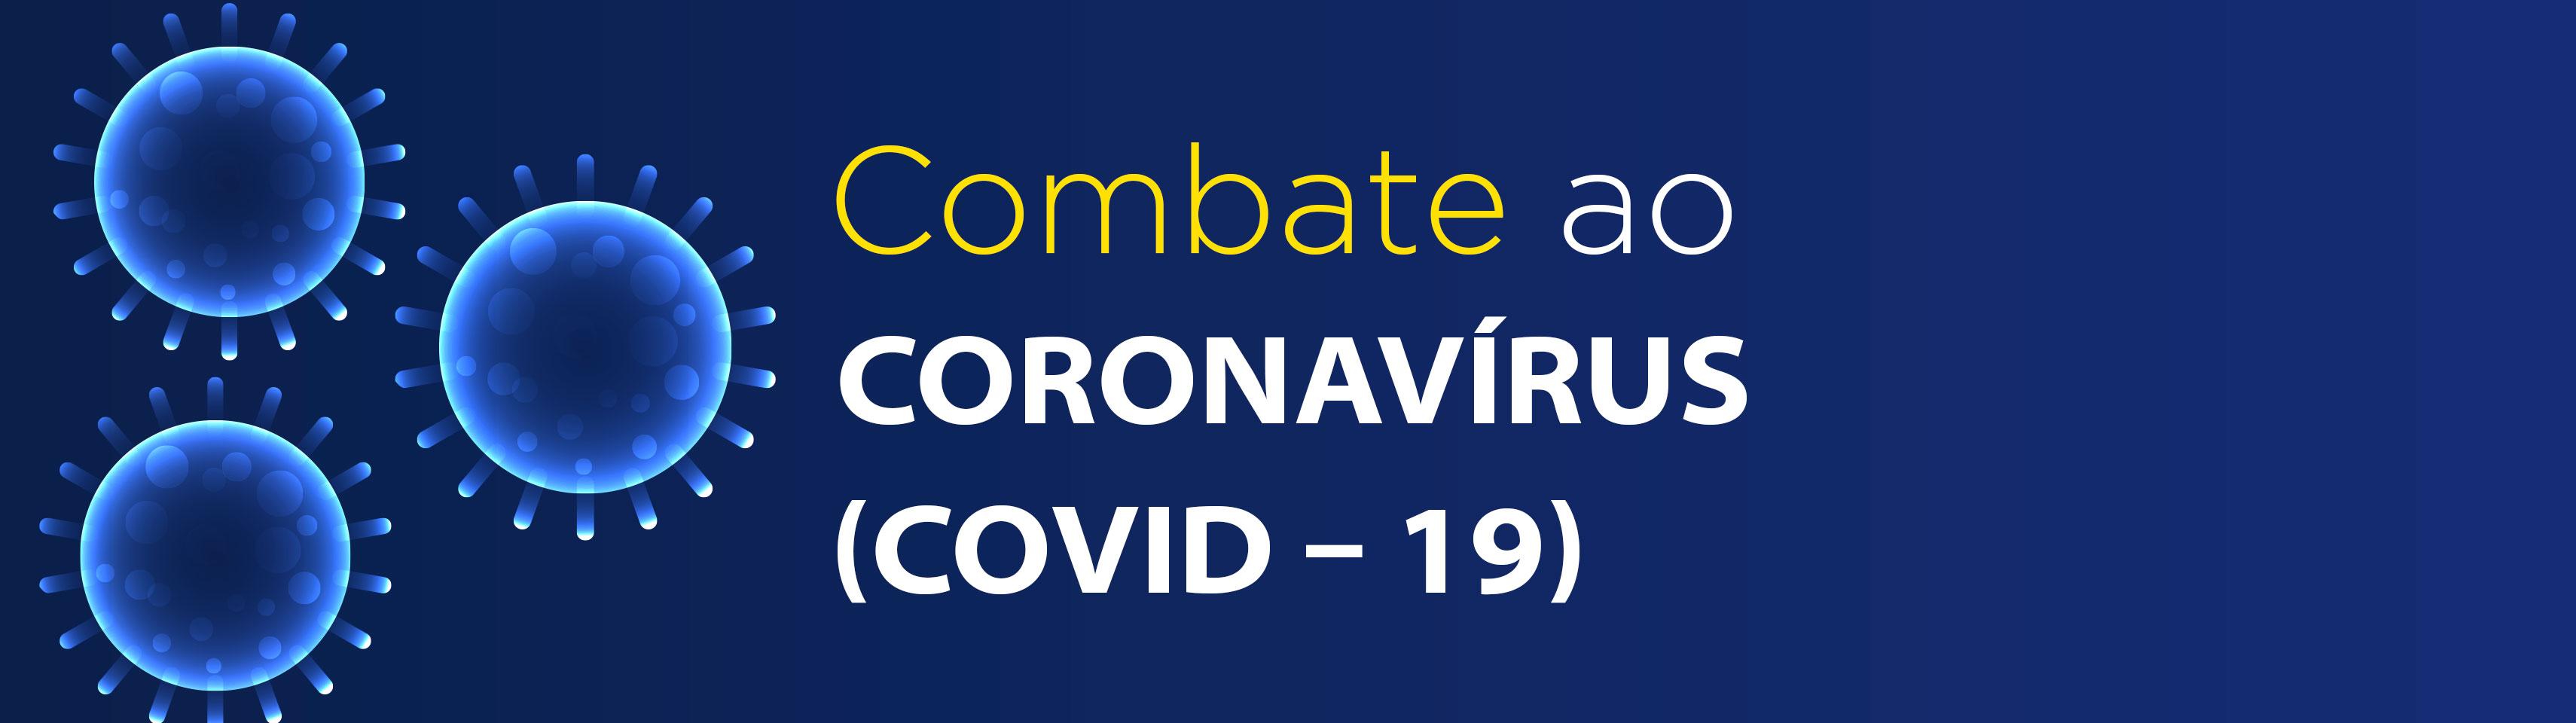 Medidas preventivas durante pandemia de Coronavírus